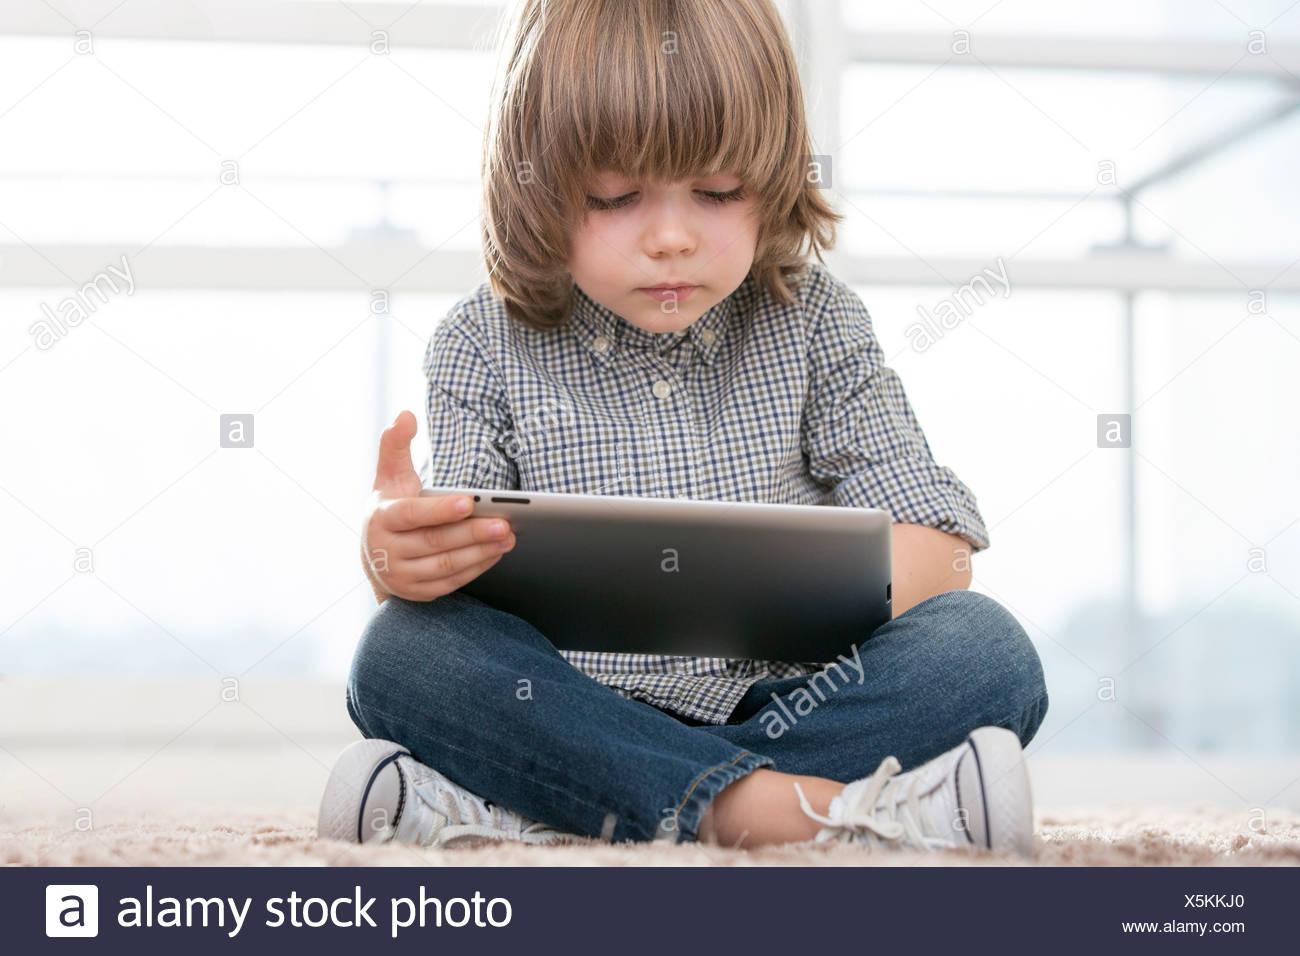 Full length of boy using digital tablet in living room - Stock Image